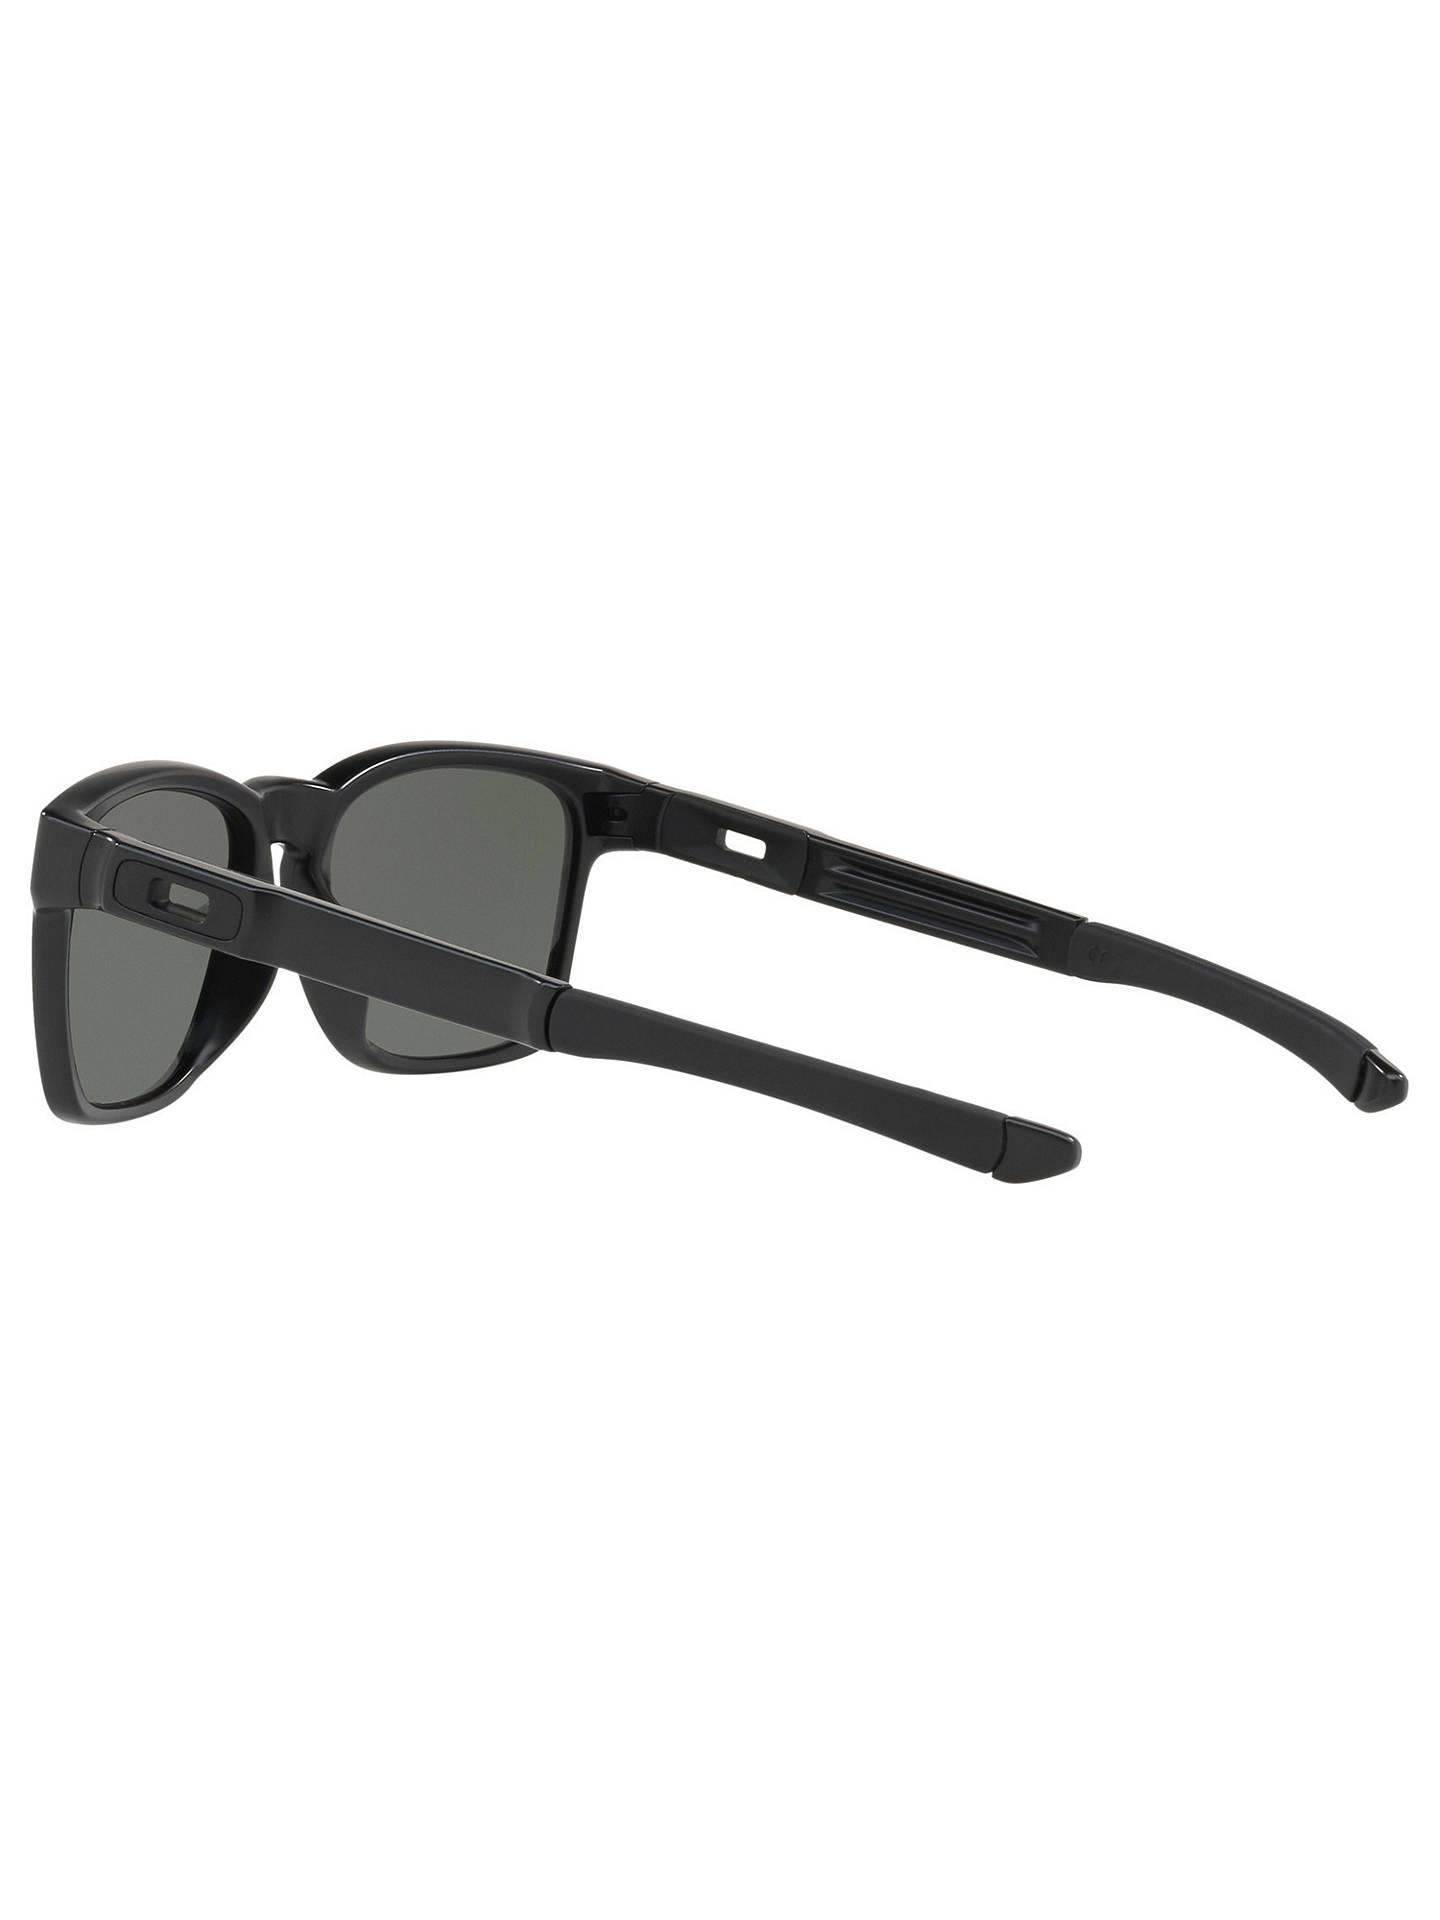 ... BuyOakley OO9272 Catalyst Prizm Polarised Rectangular Sunglasses, Matte  Black Mirror Grey Online at johnlewis ... 3ca6f2aac543